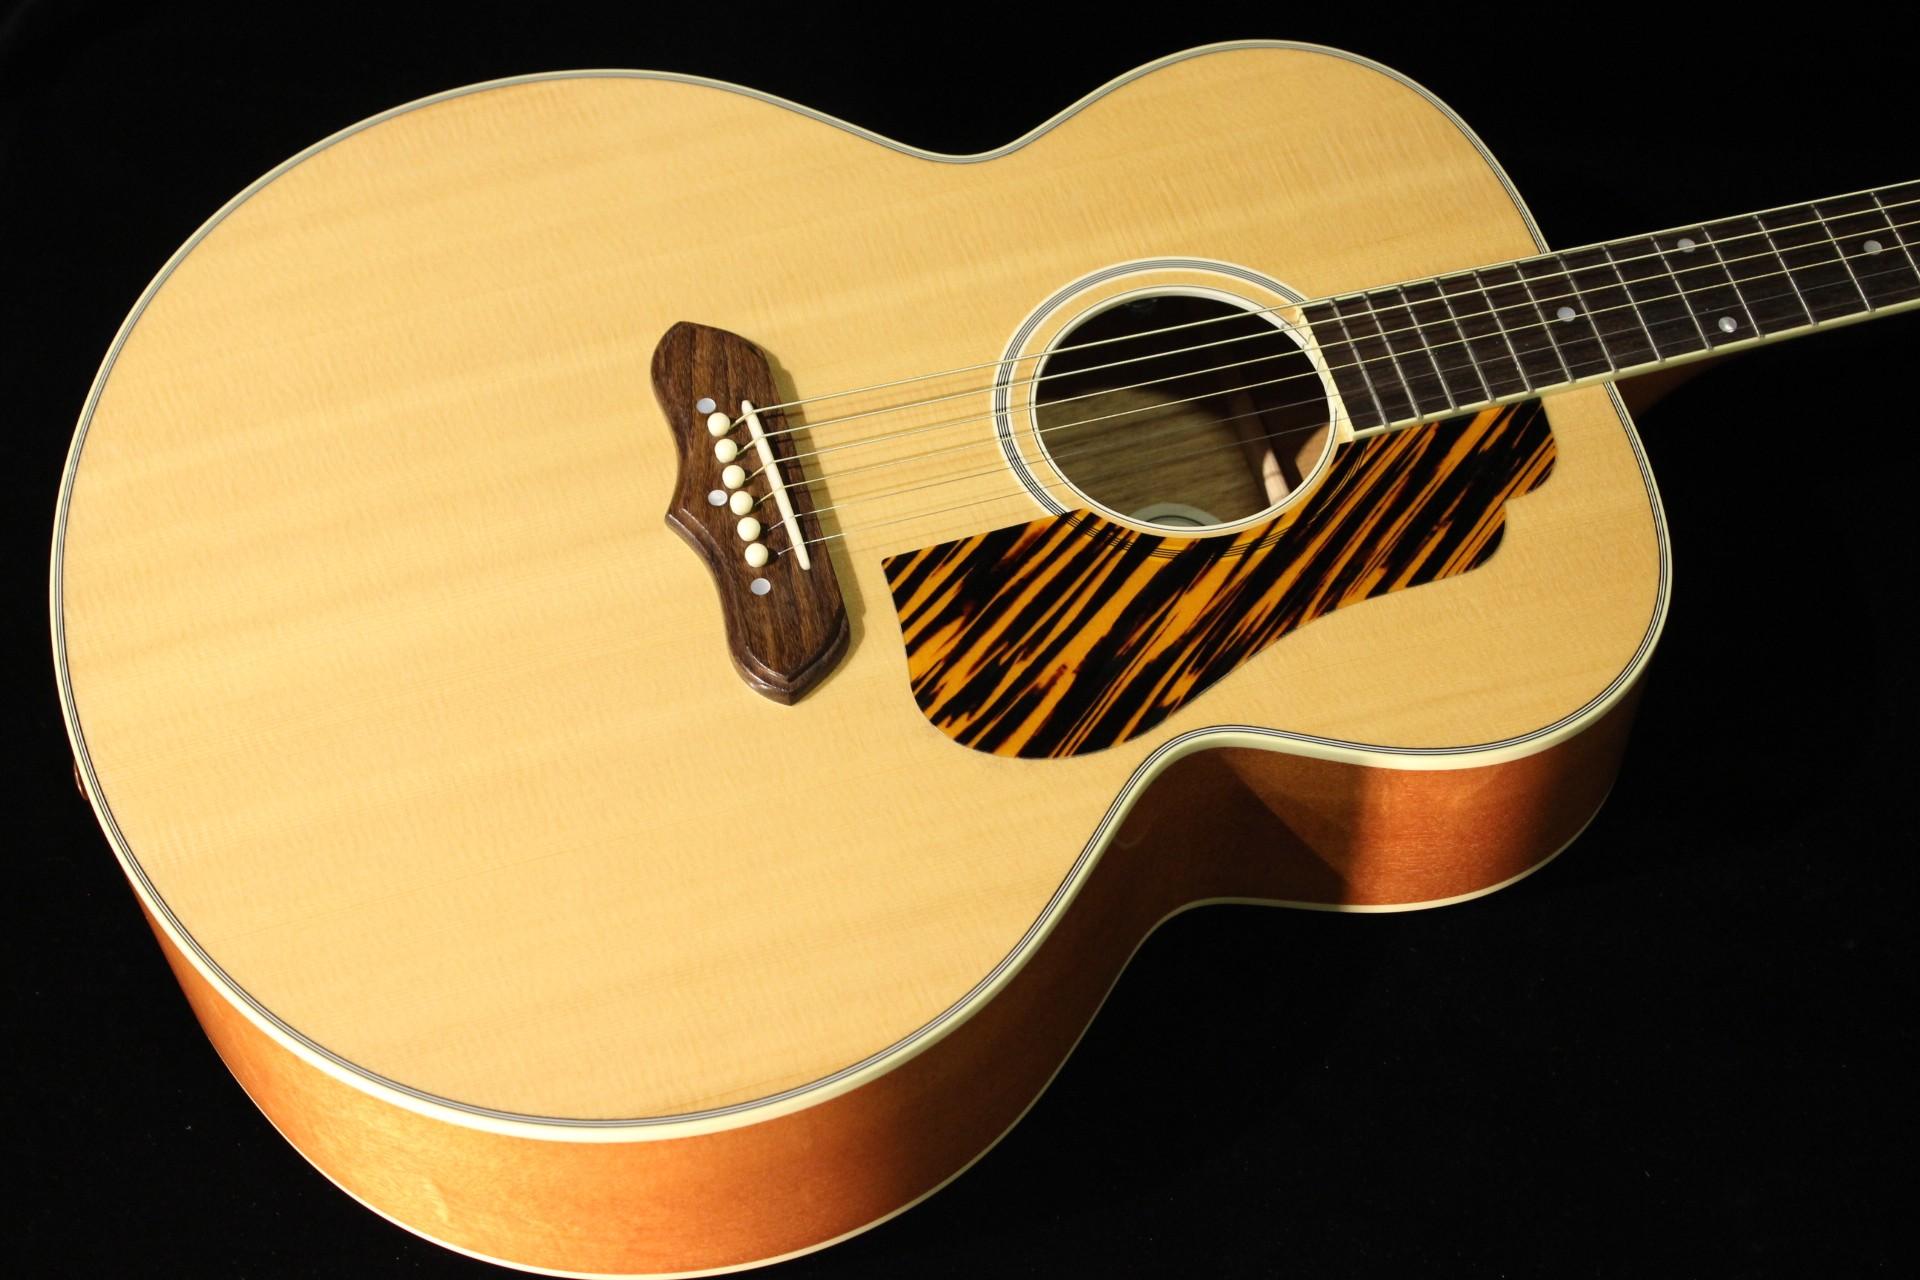 gibson 1941 sj 100 antique natural sn 11203034 gino guitars. Black Bedroom Furniture Sets. Home Design Ideas